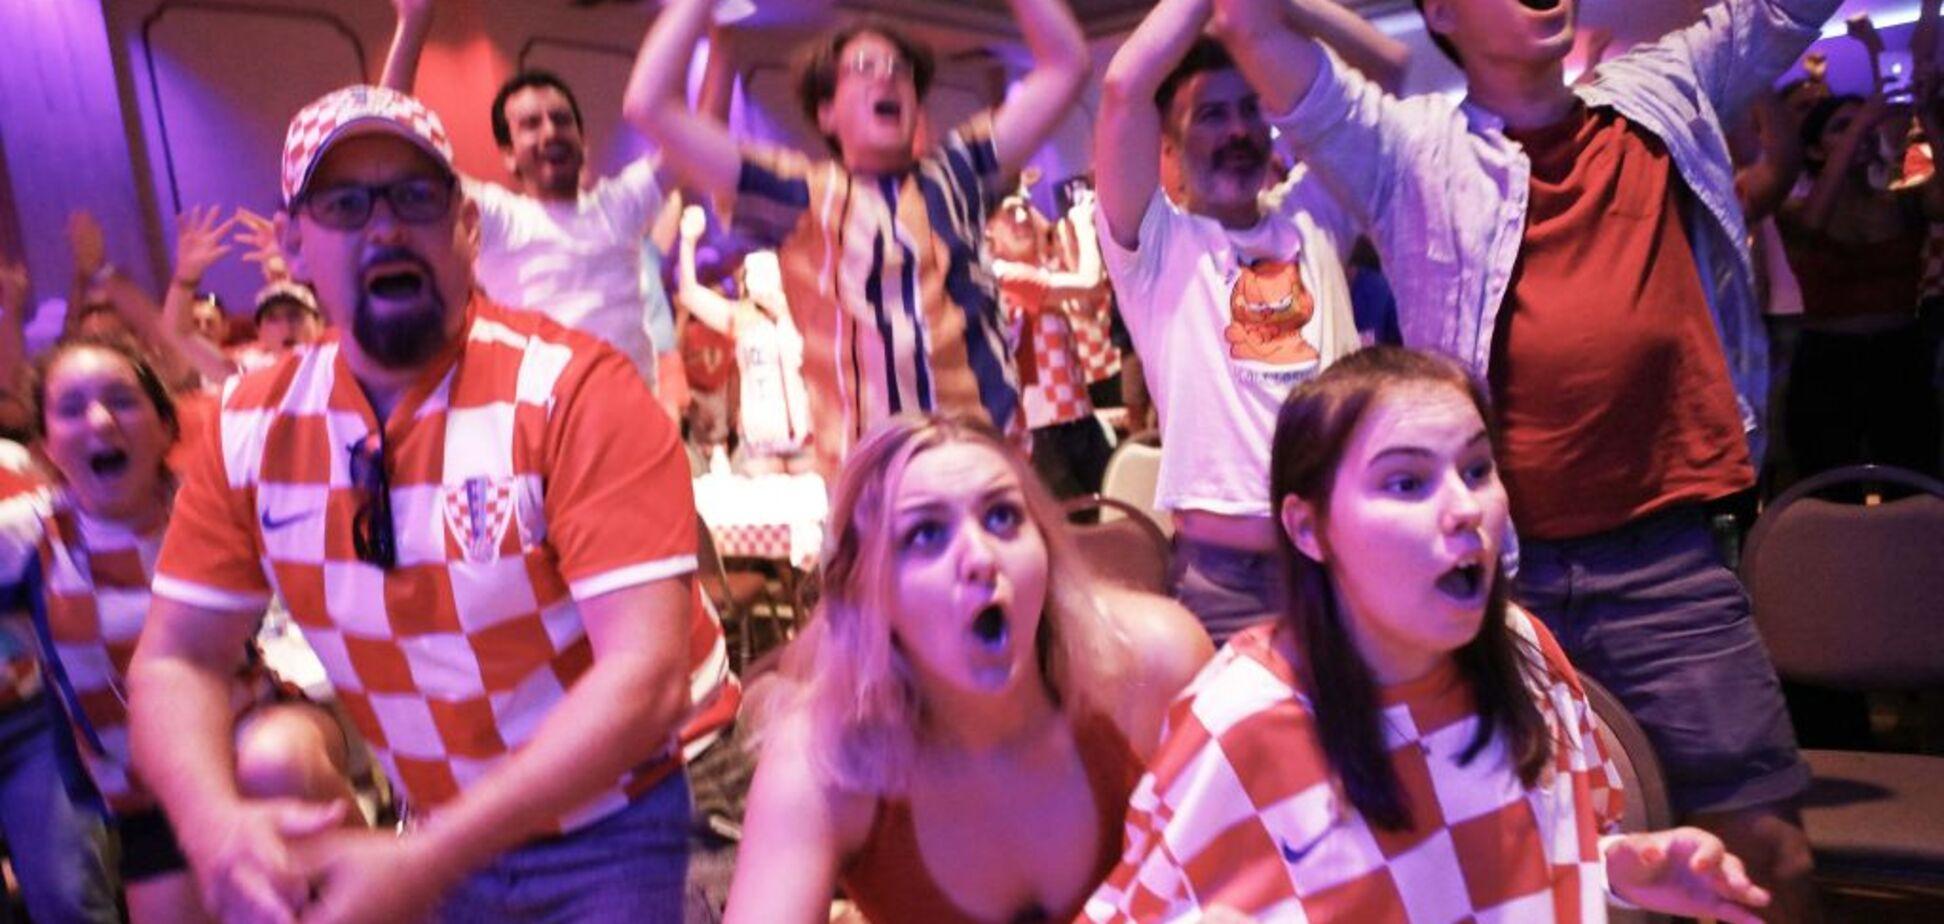 Пятый гол в матче! Франция – Хорватия: онлайн-трансляция финала ЧМ-2018